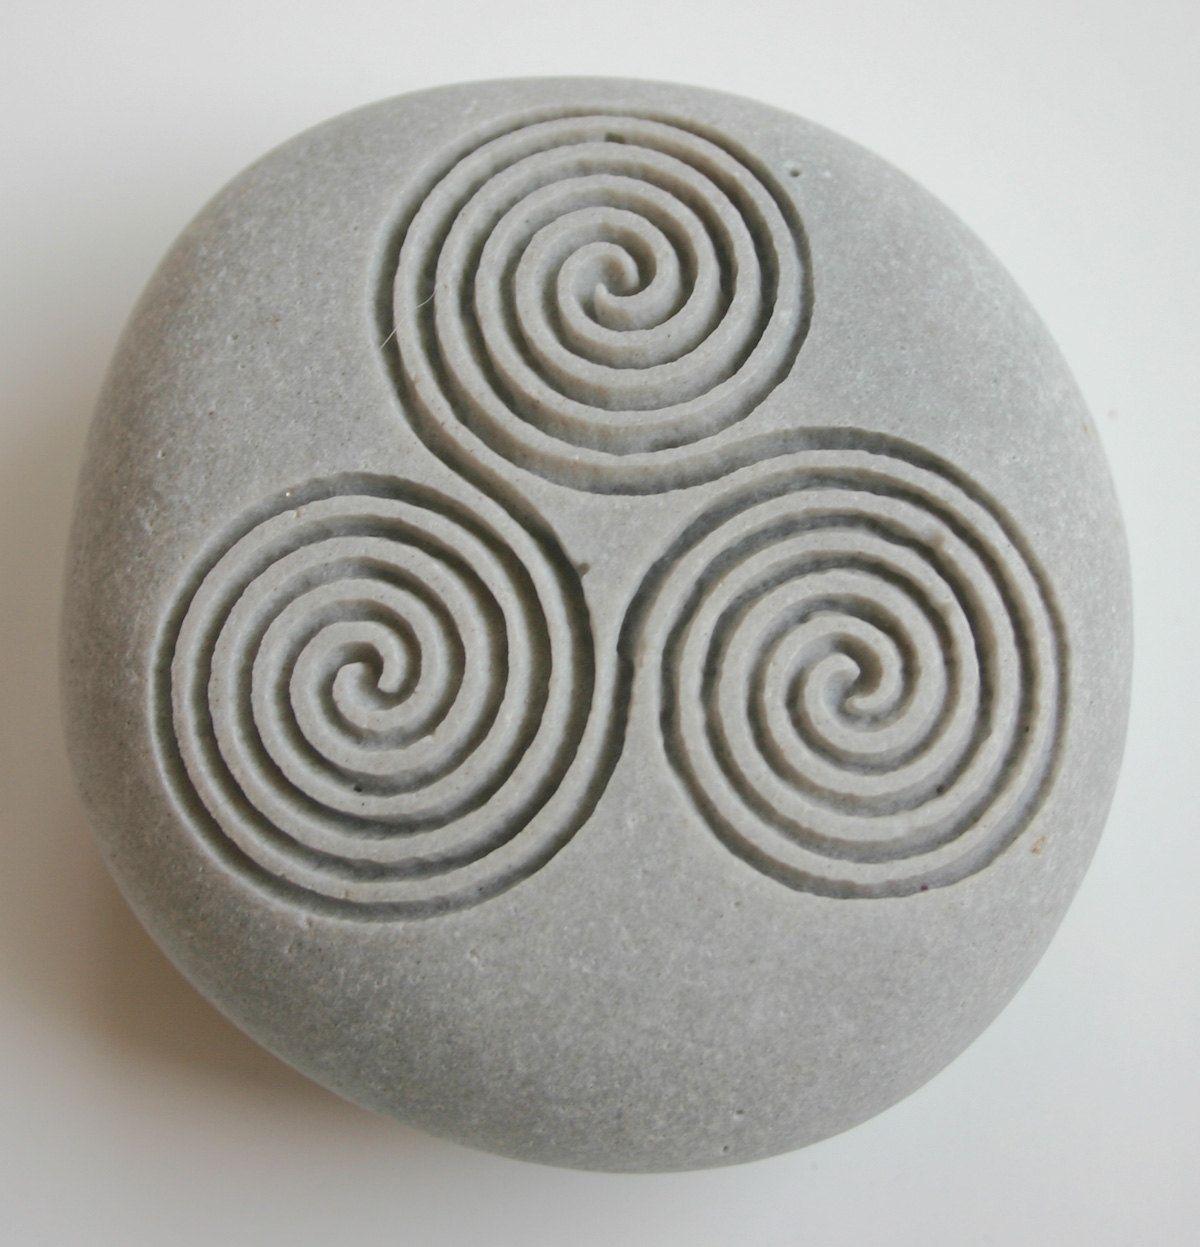 Newgrange triple spiral engraved light grey stone female power newgrange triple spiral engraved light grey stone female power triskele celtic symbol buycottarizona Images